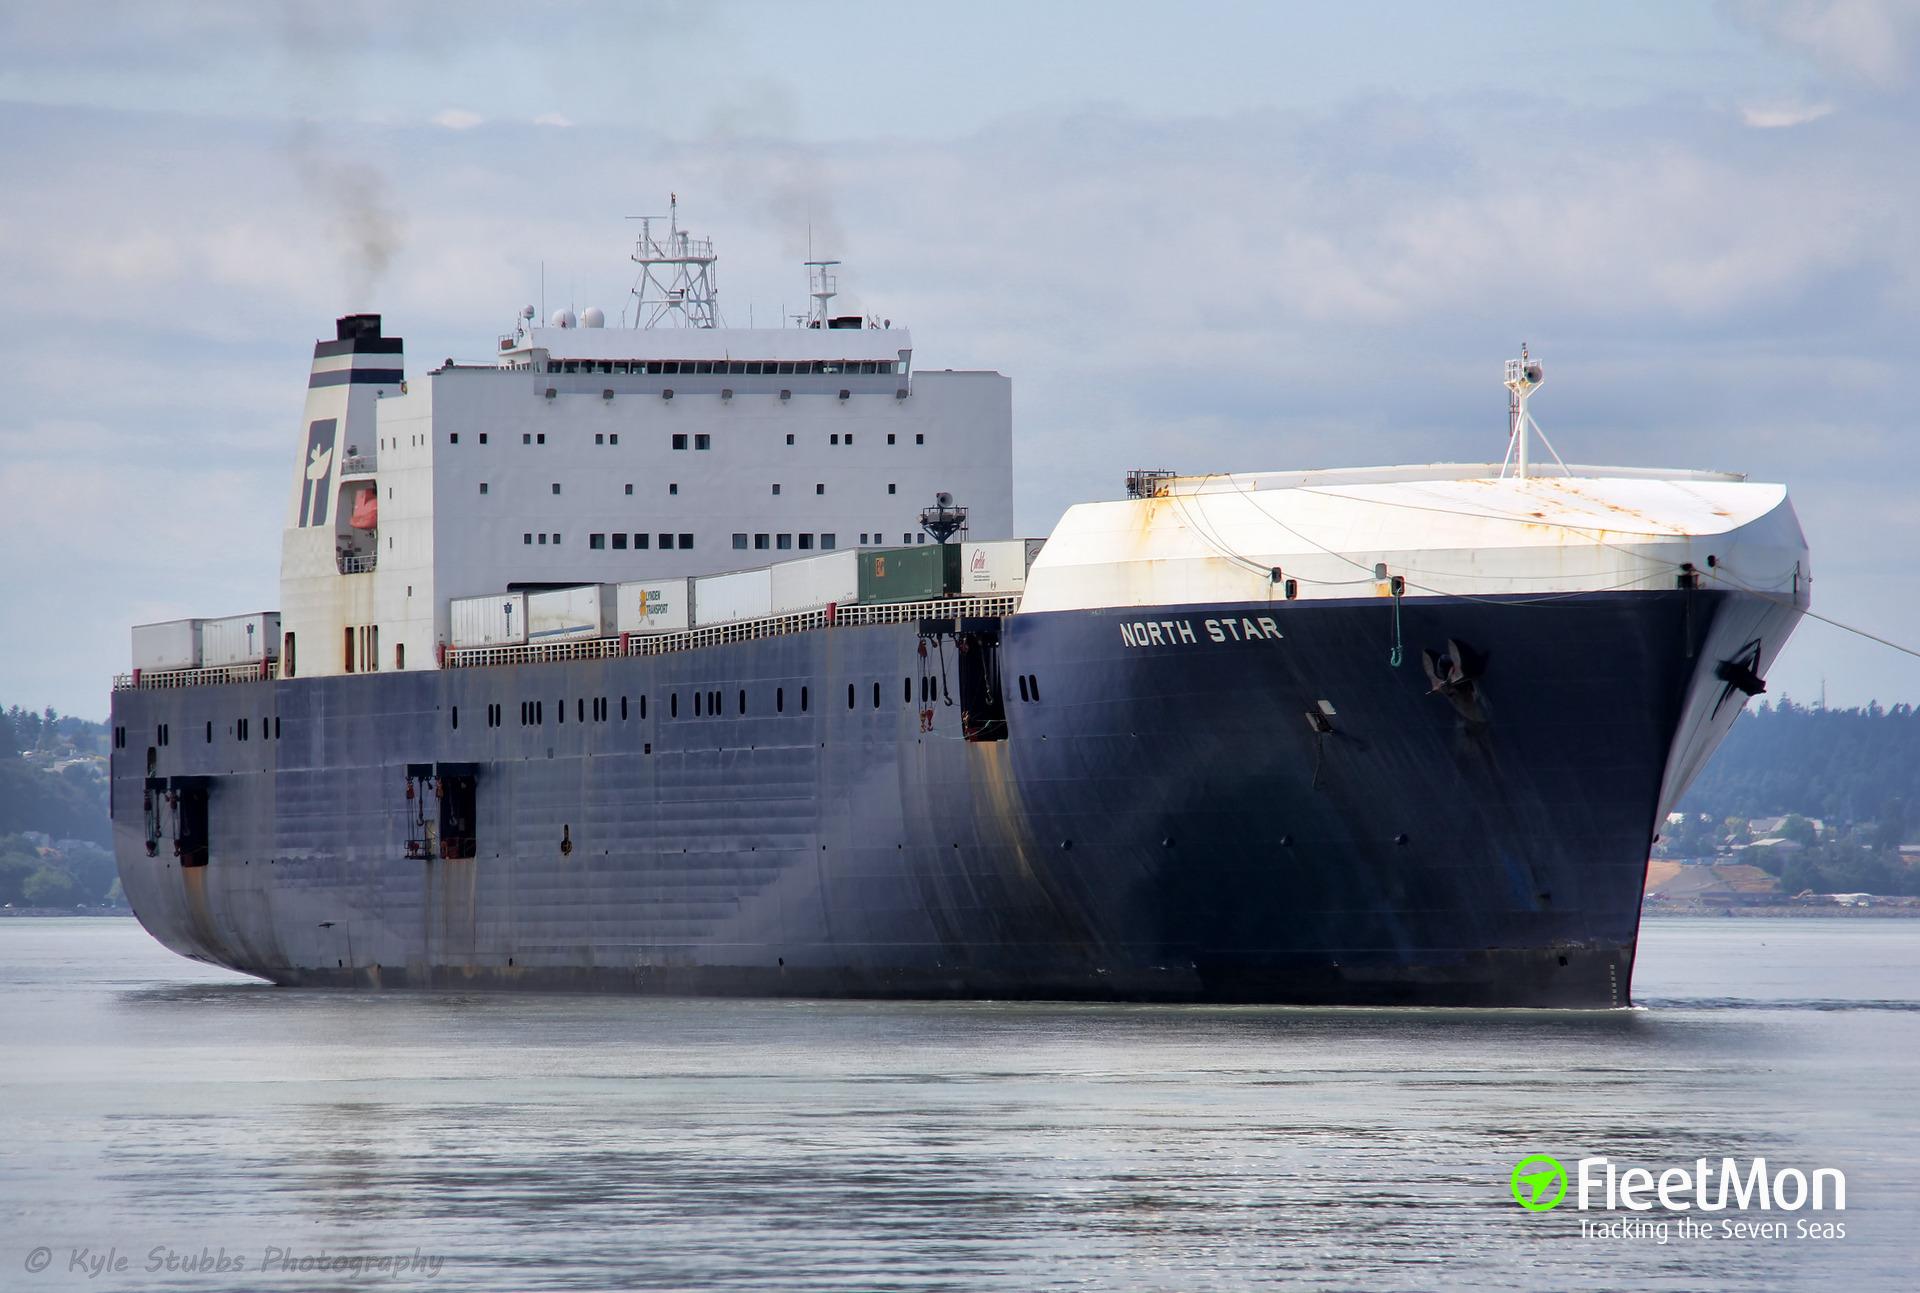 US ro-ro cargo ship NORTHSTAR disabled, drifting off British Columbia coast